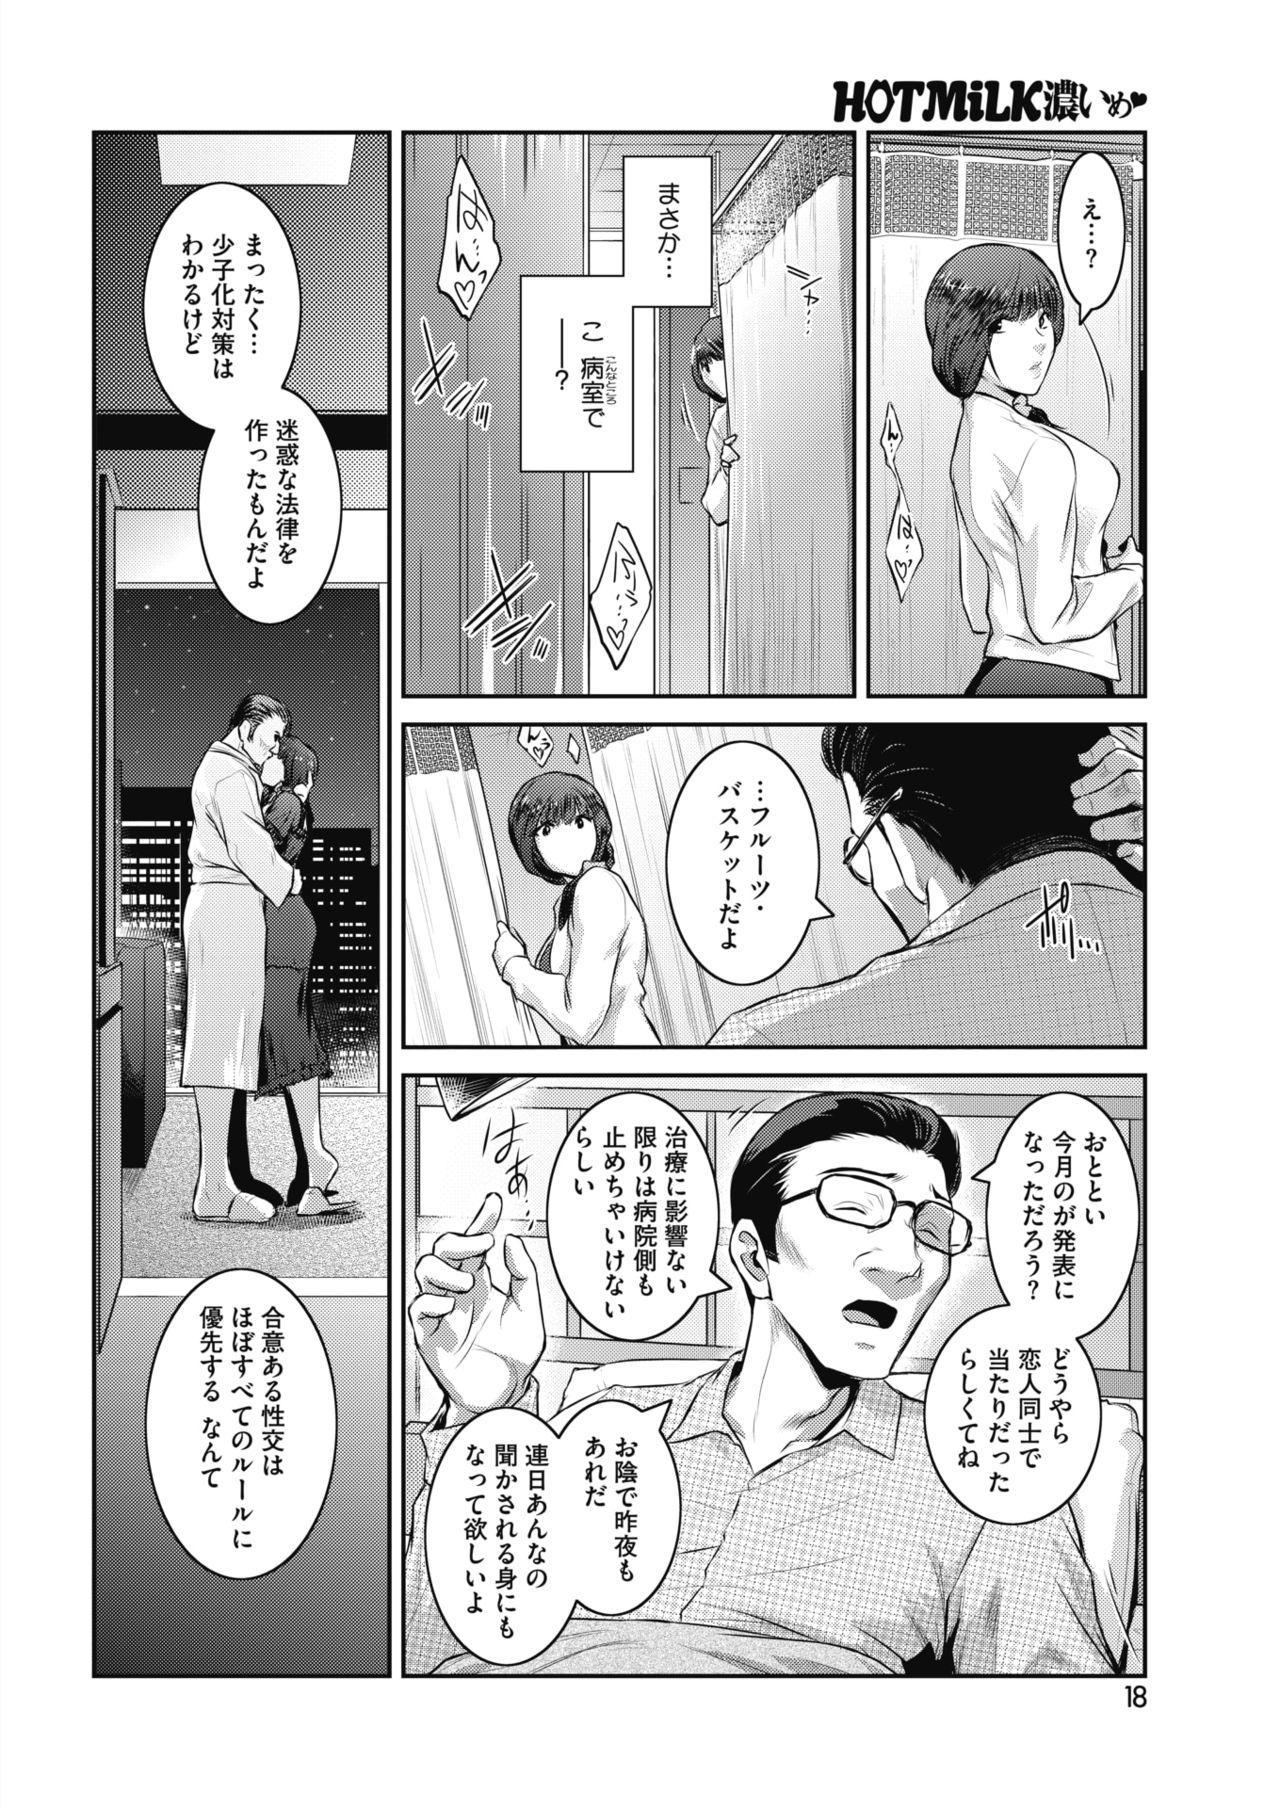 COMIC HOTMiLK Koime Vol. 17 10